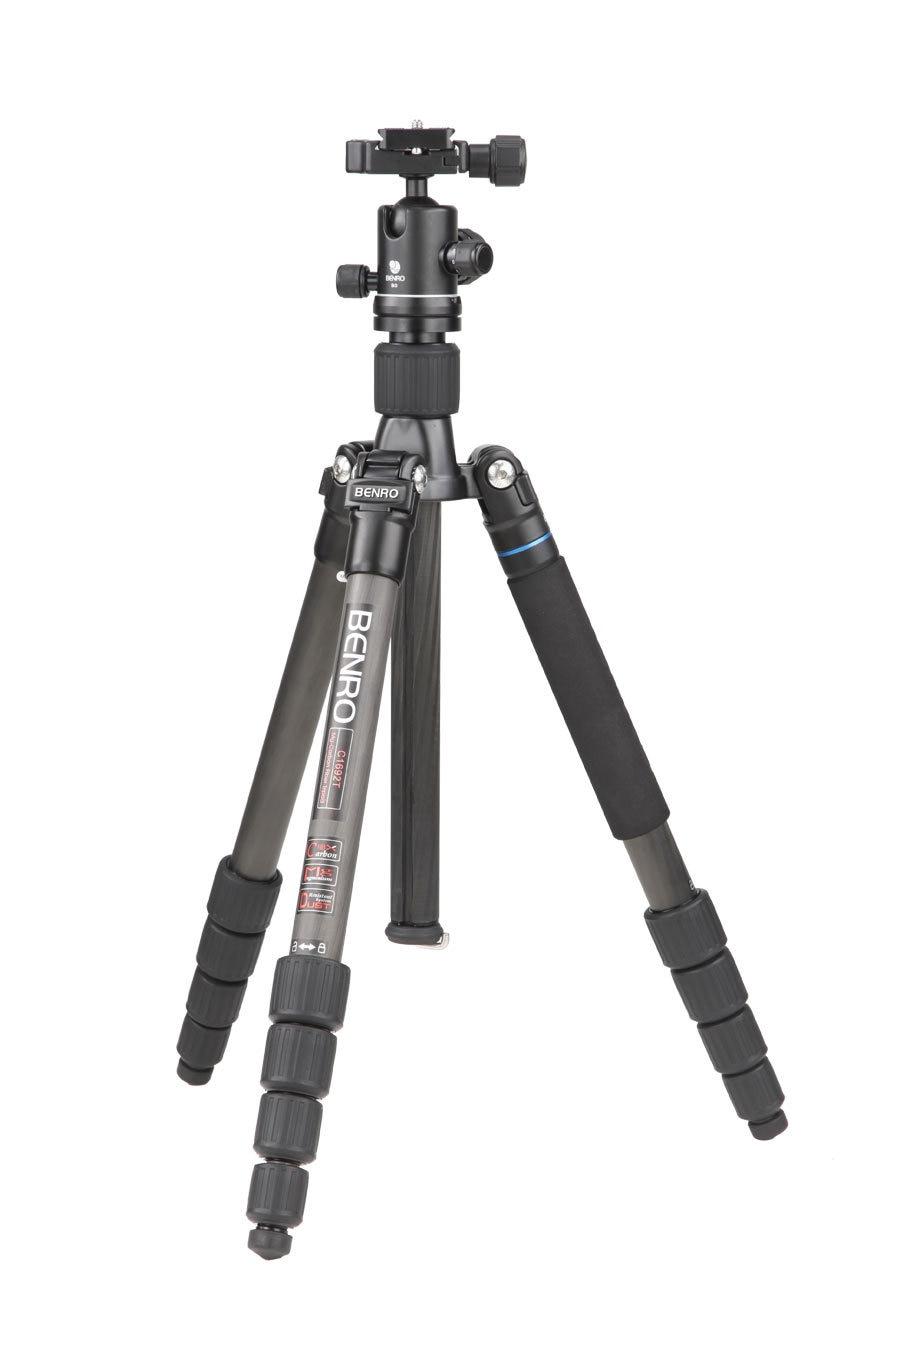 Benro C1692TB0 Carbon Fiber Tripod Kit Compact Tripod With B0 Professional Ball Video Head Portable Photography Set For Hiking benro a 0190 b 00 a0190tb00